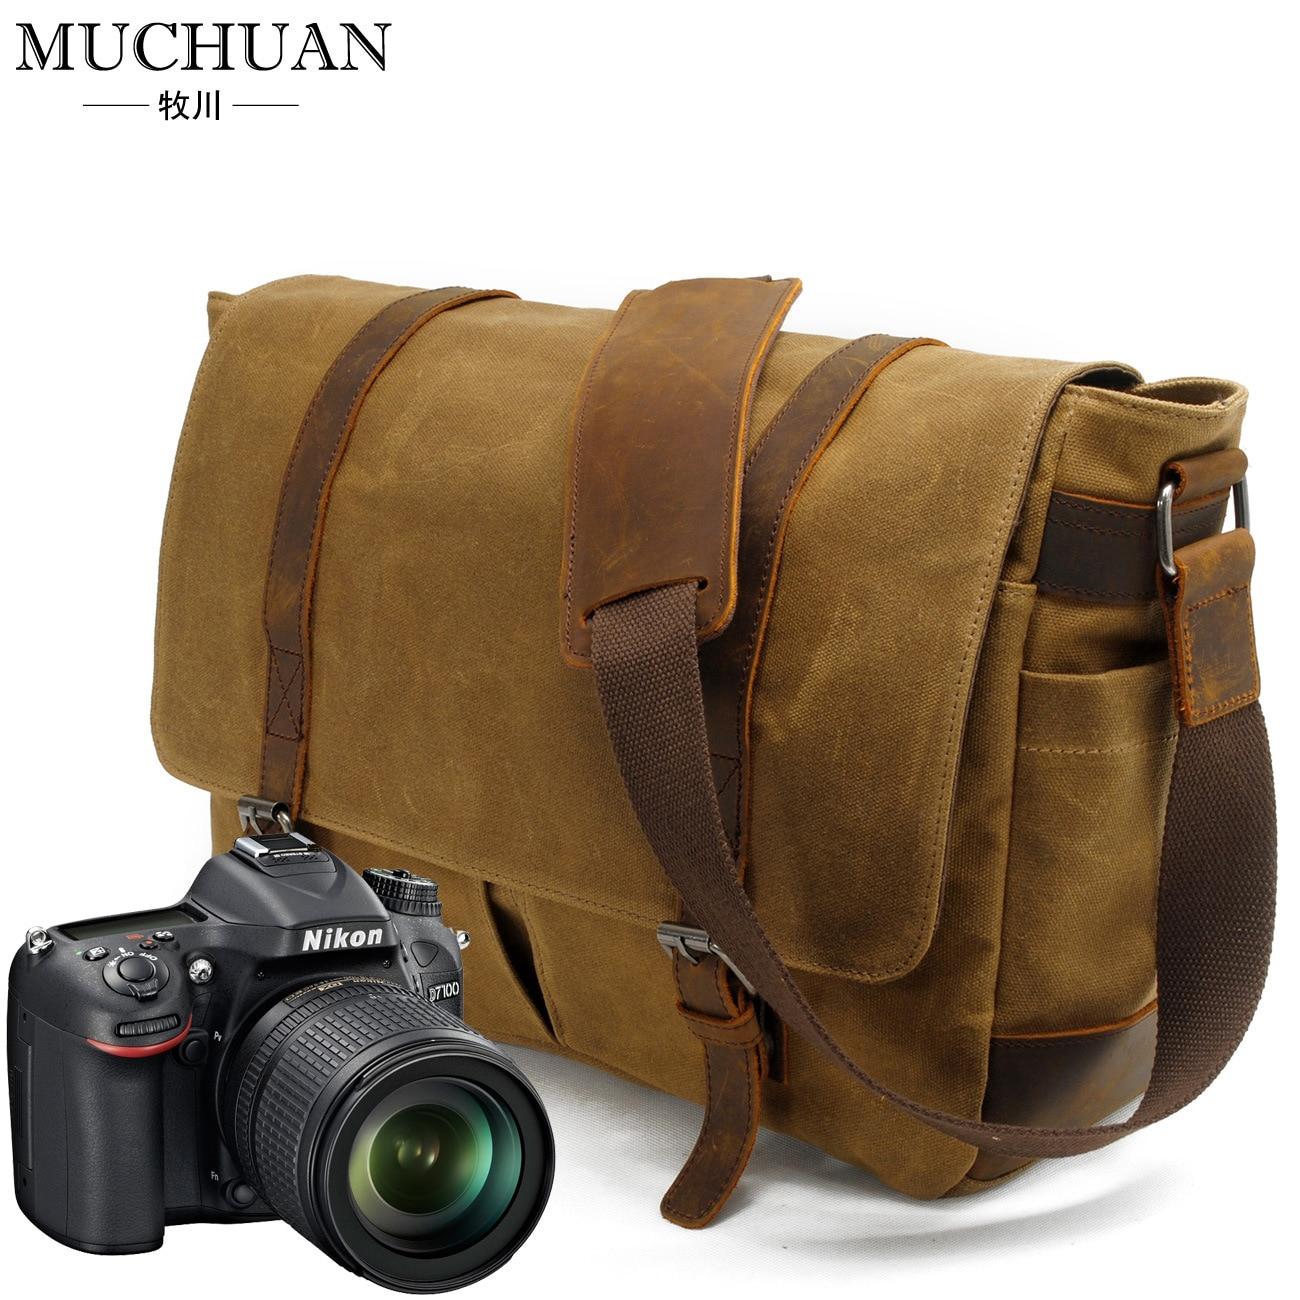 The camera bag leisure batik canvas with crazy horse leather SLR Camera Bag batik batik зимний комплект маруся 350 200гр сиреневый